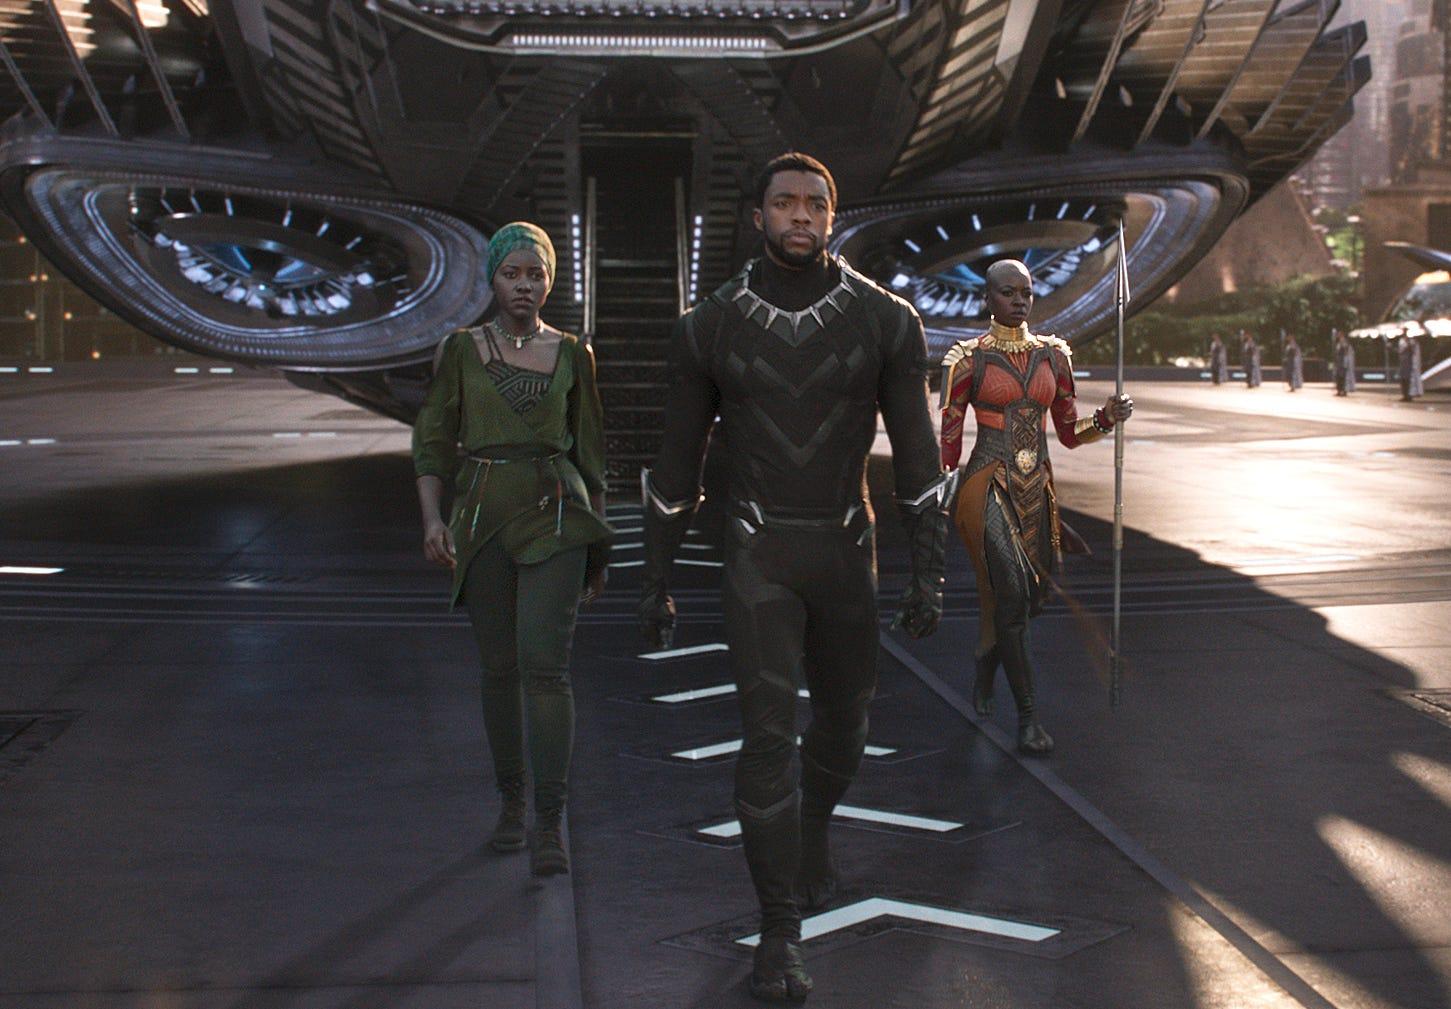 A scene from Marvel Studios' motion picture 'Black Panther'..L to R: Nakia (Lupita Nyong'o), T'Challa/Black Panther (Chadwick Boseman) and Okoye (Danai Gurira)..Ph: Film Frame..©Marvel Studios 2018 [Via MerlinFTP Drop]